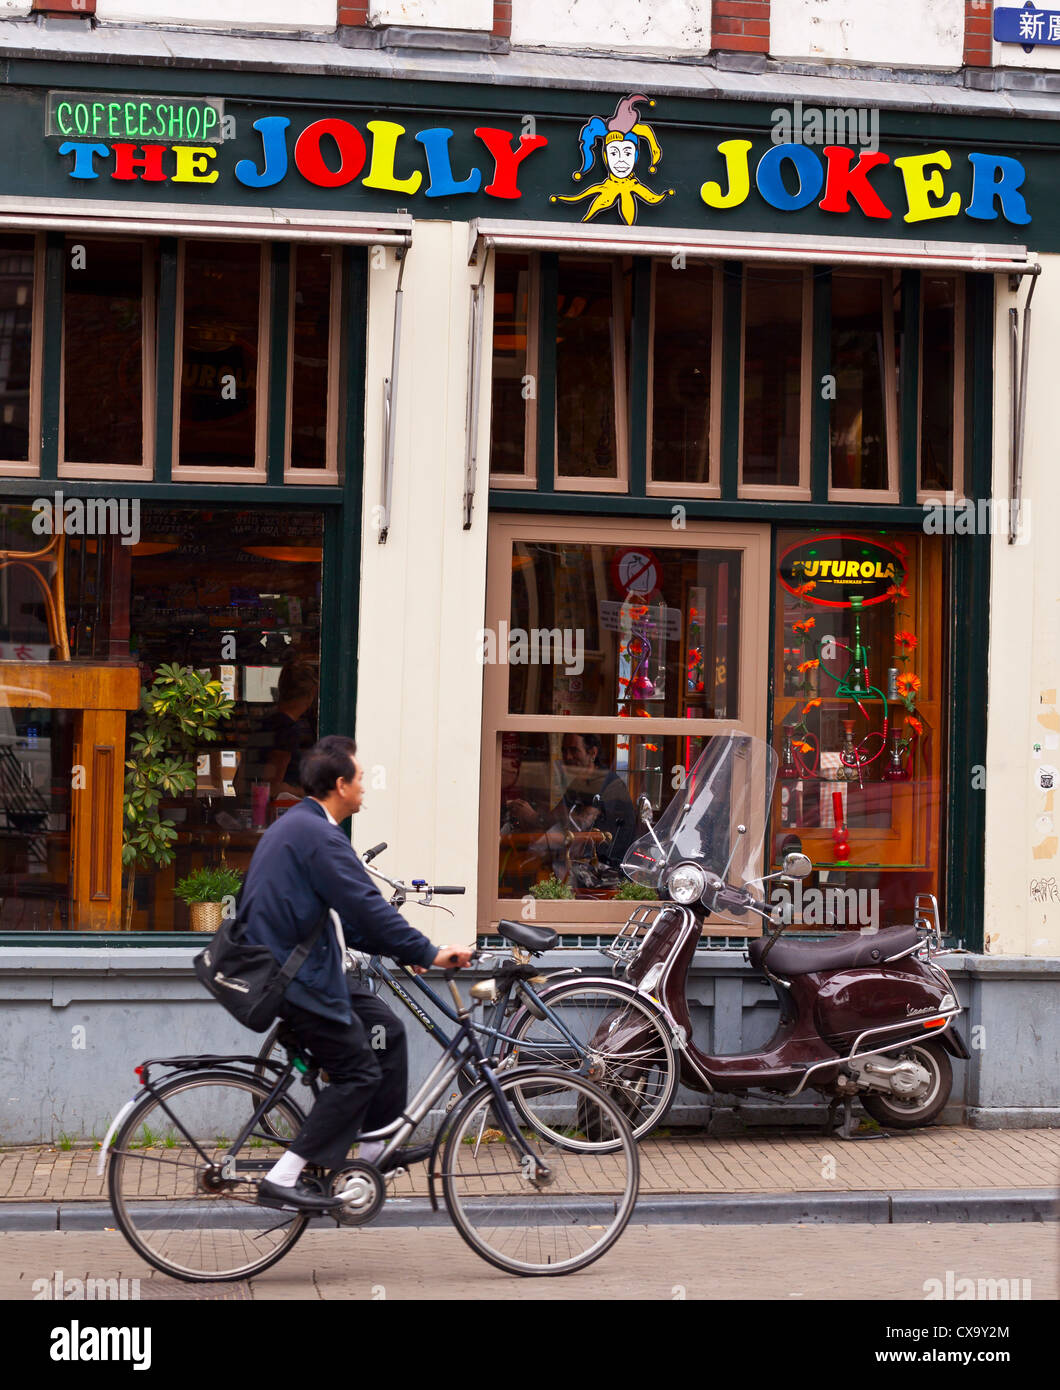 Amsterdam: Jolly Joker Coffee Shop - Amsterdam, Netherlands, Europe - Stock Image